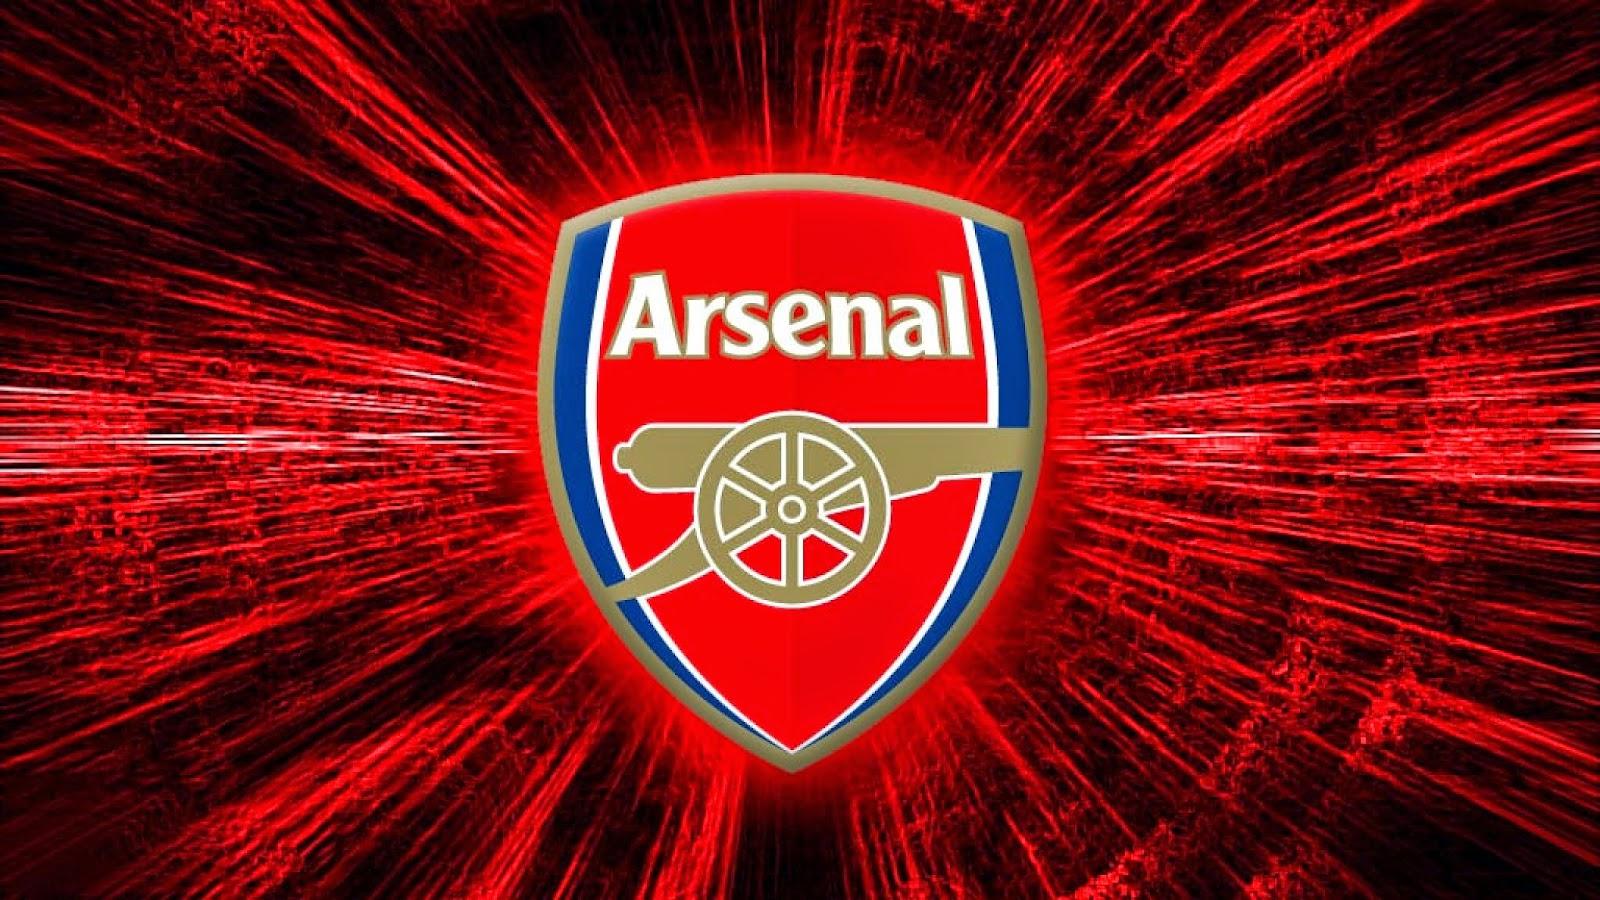 Arsenal Football Club Wallpaper Download Gambar